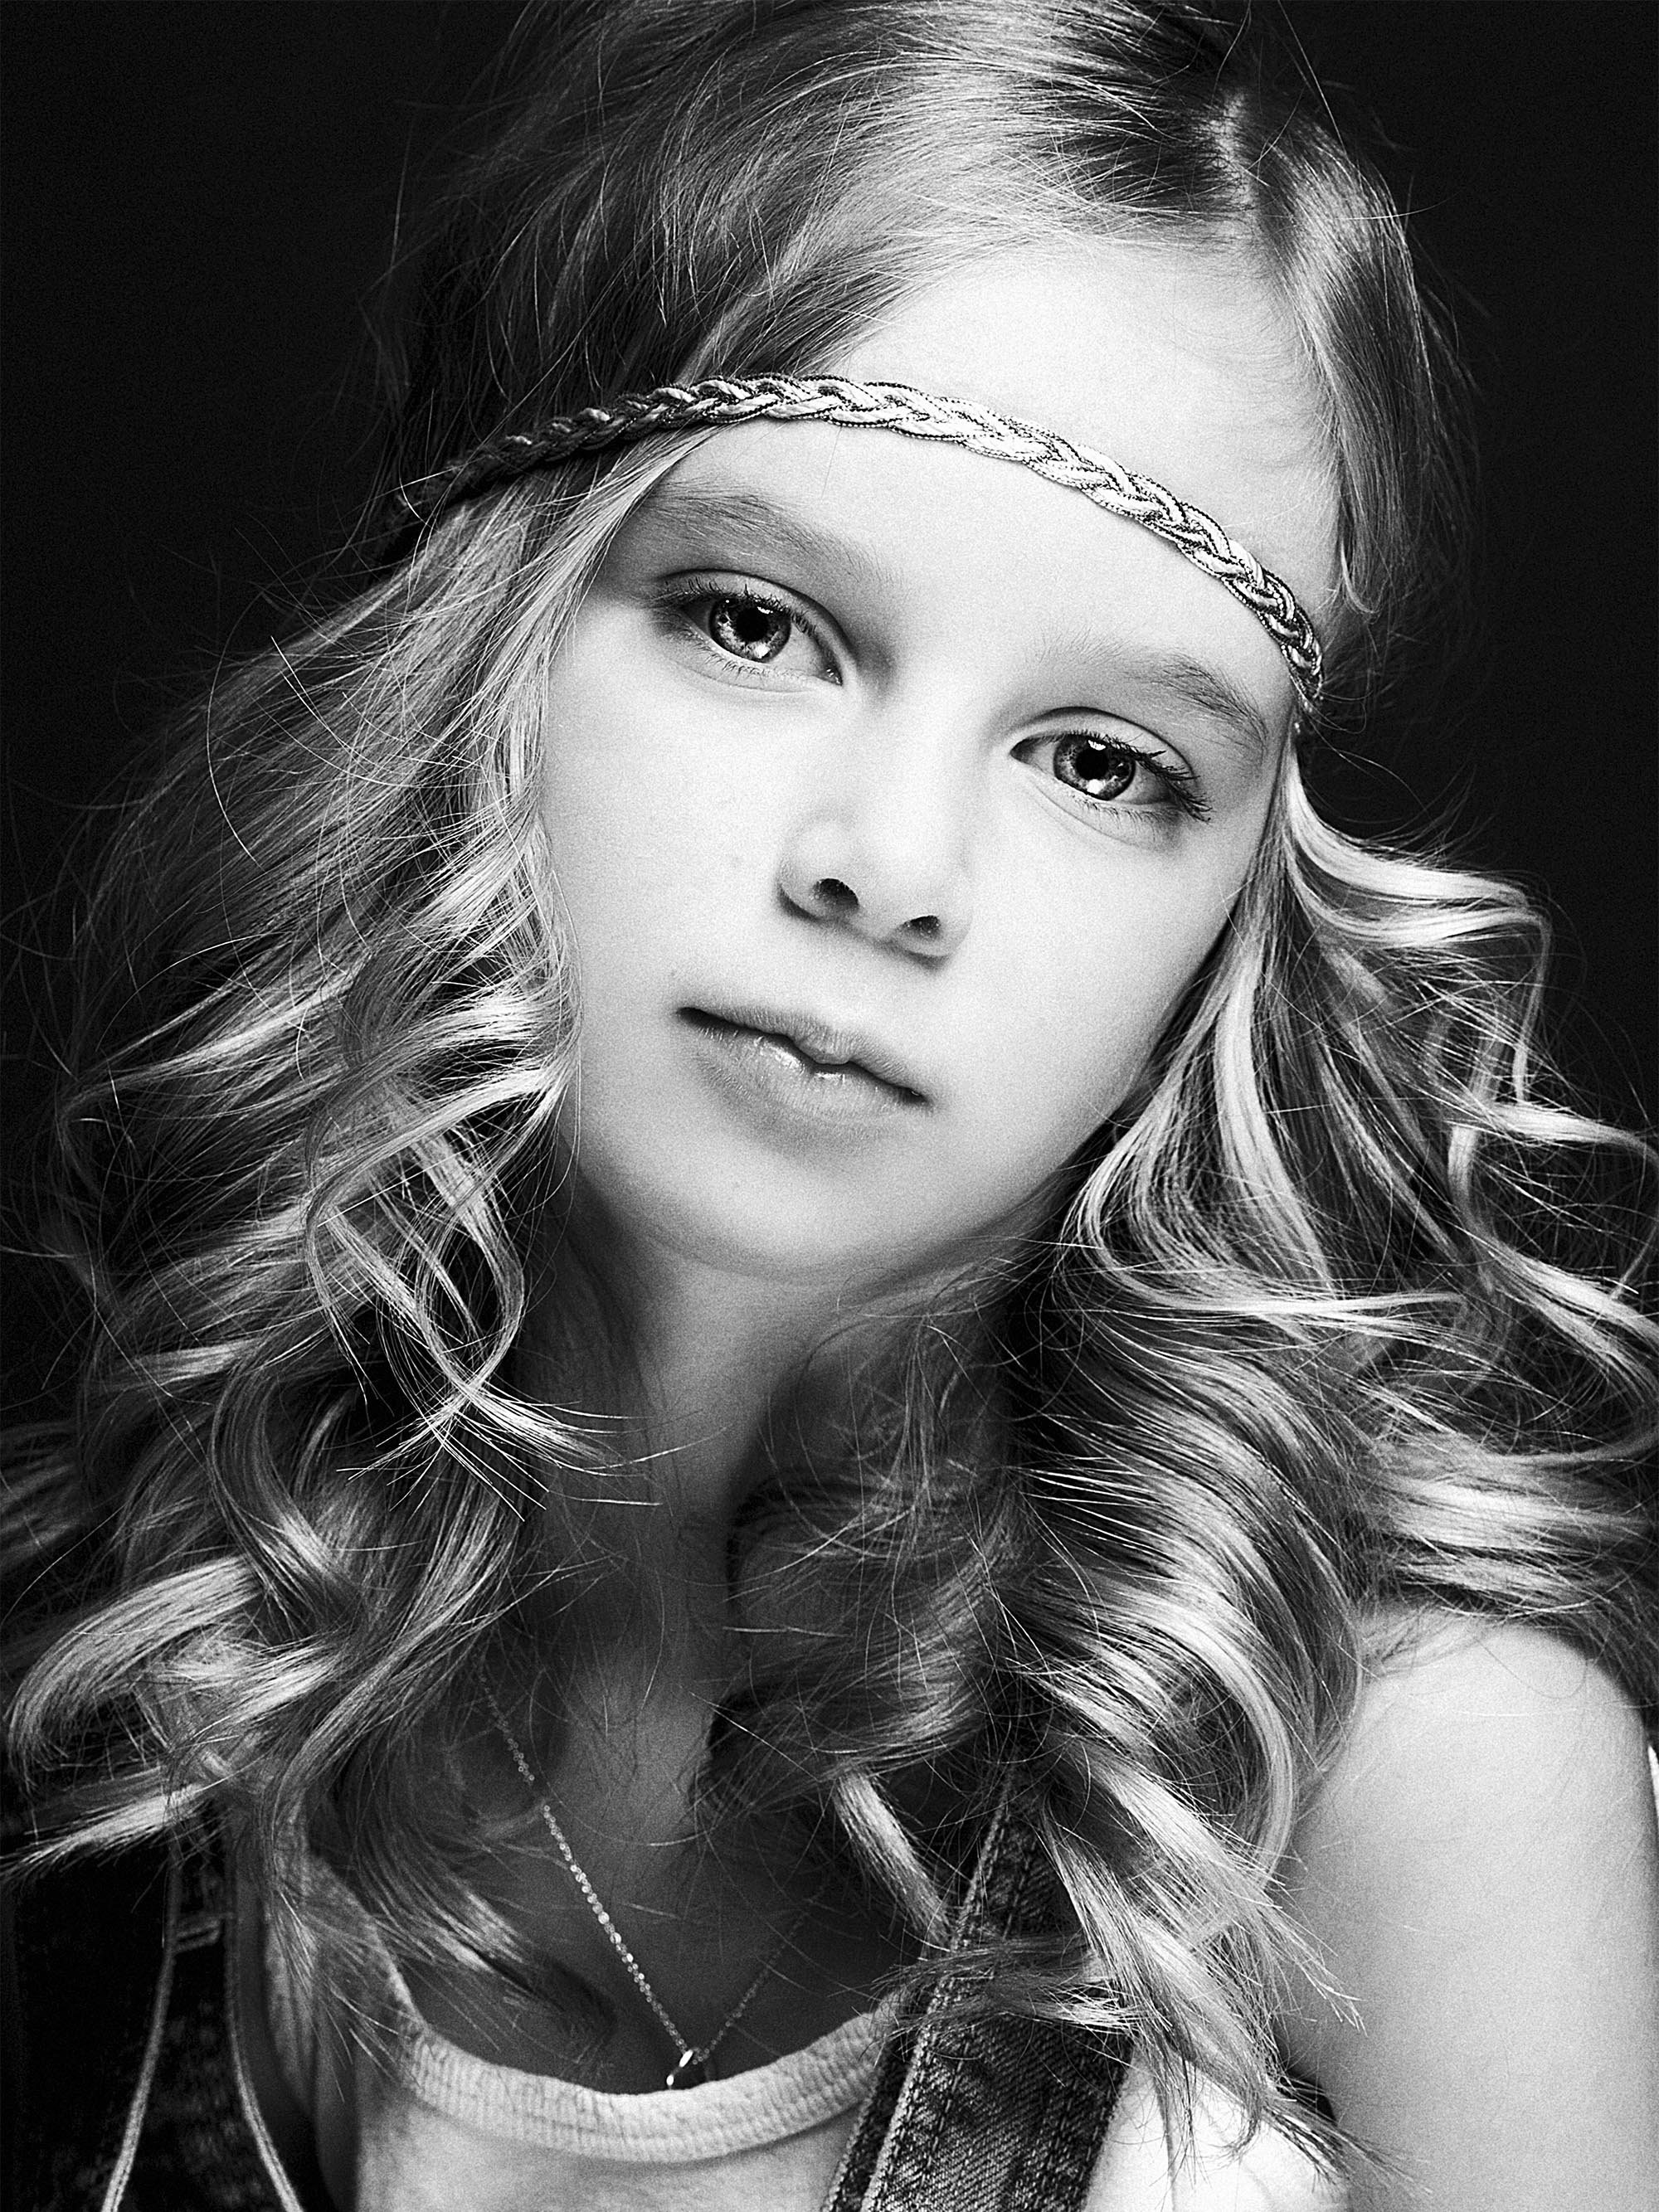 nyc-photographers-kids-modeling-10025.jpg